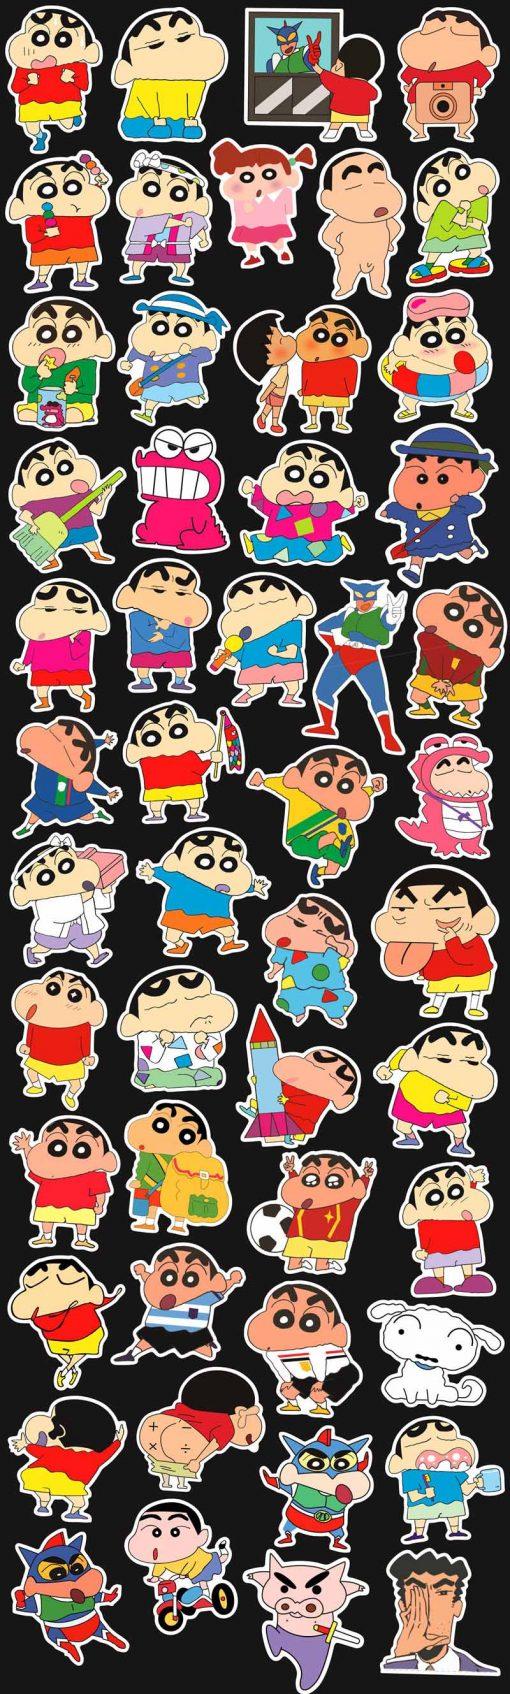 Crayon Shin-chan cartoon Stickers pack vinyl decals 50 pieces